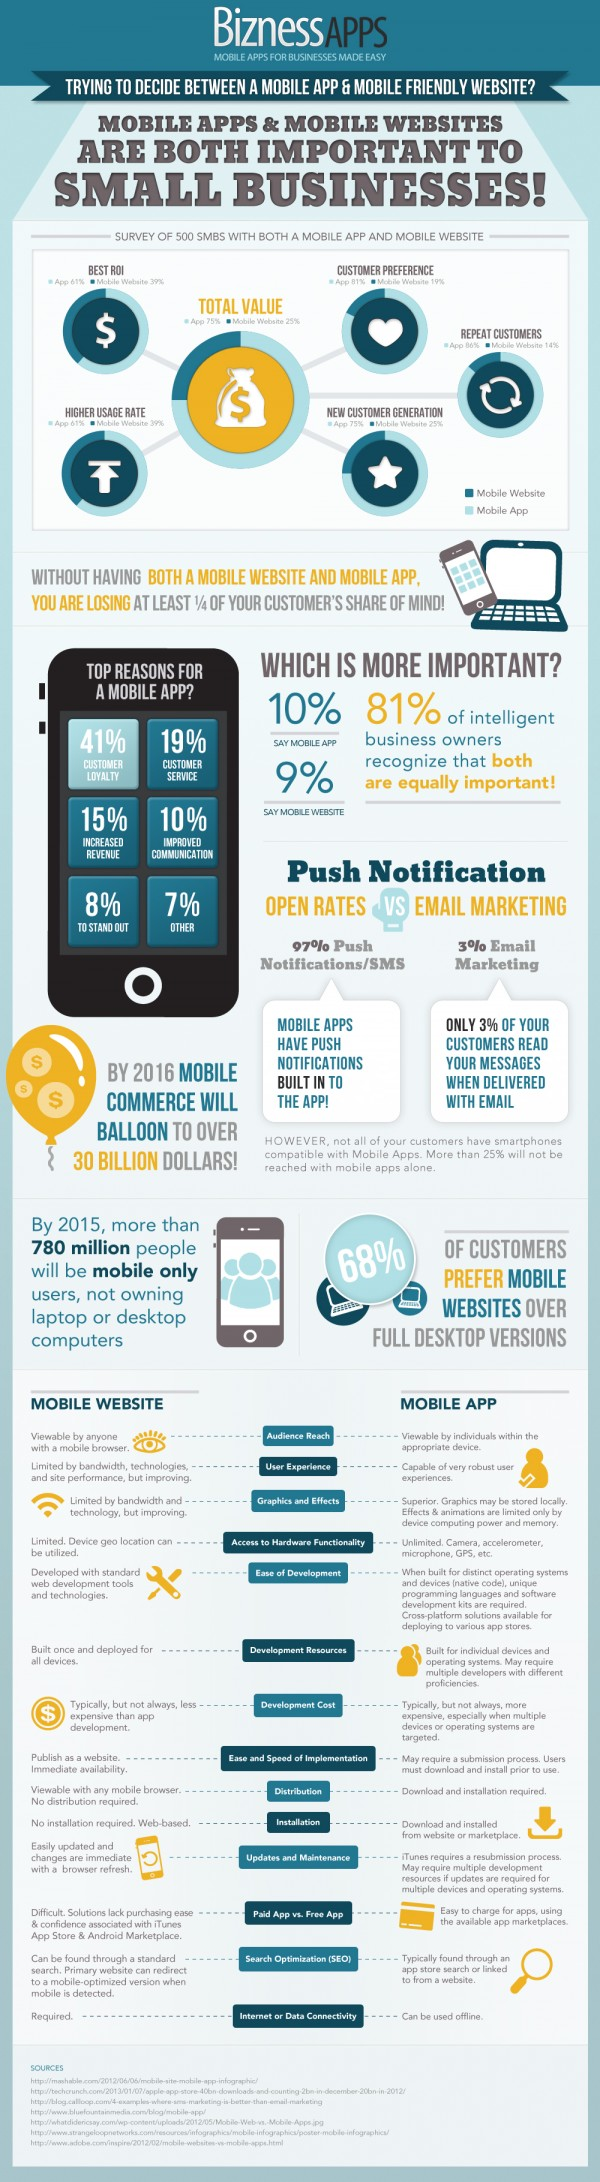 mobile website vs mobile app